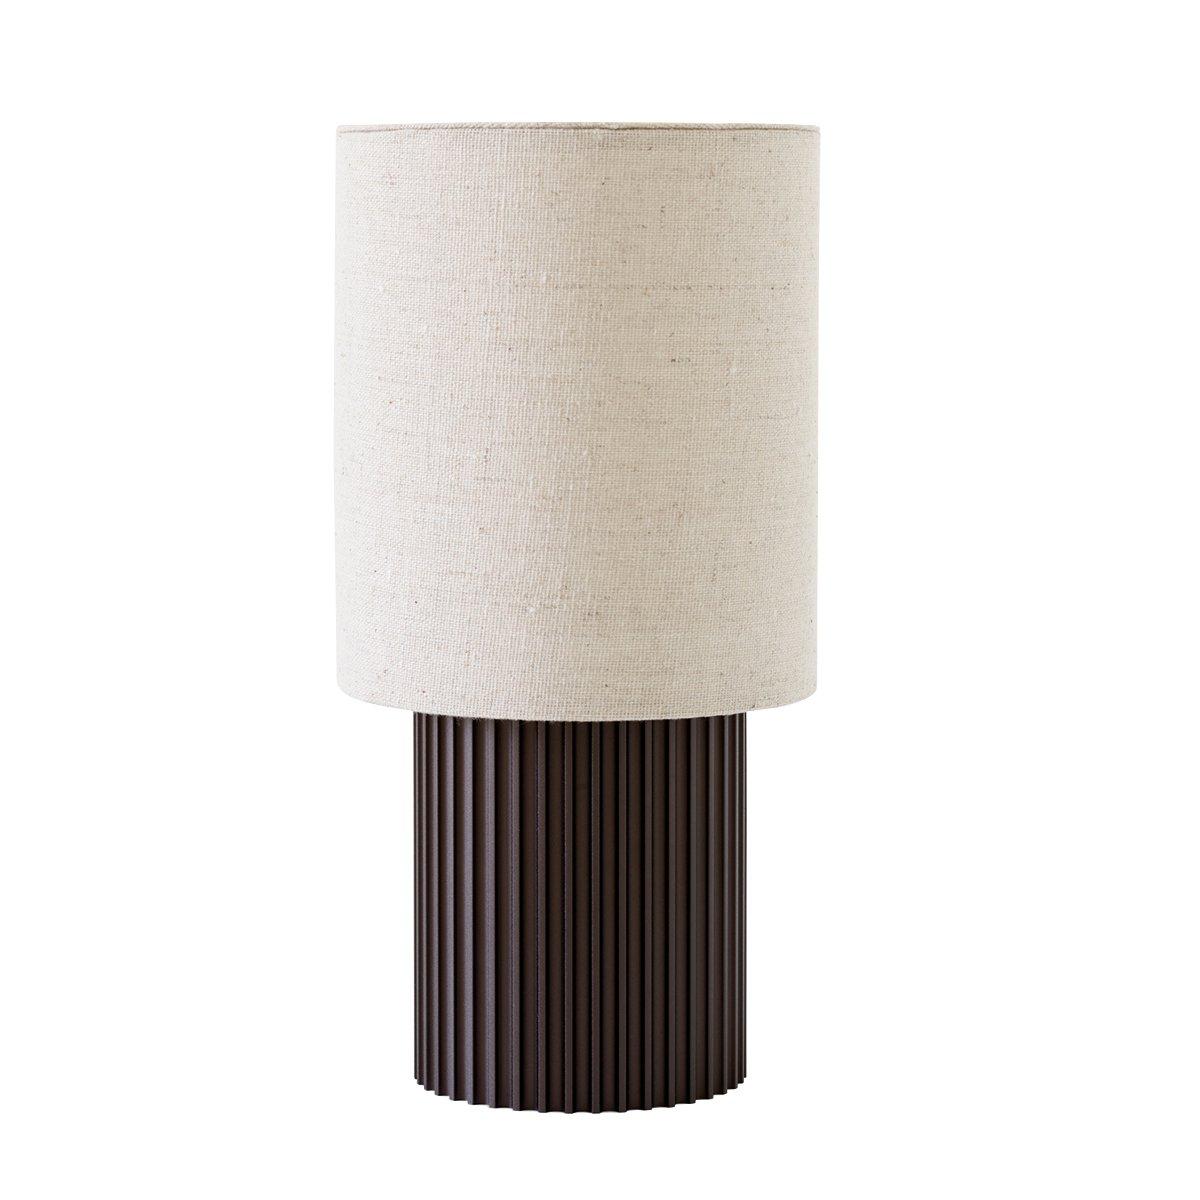 &Tradition Manhattan SC52 Draagbare Tafellamp - Bronzed Brass